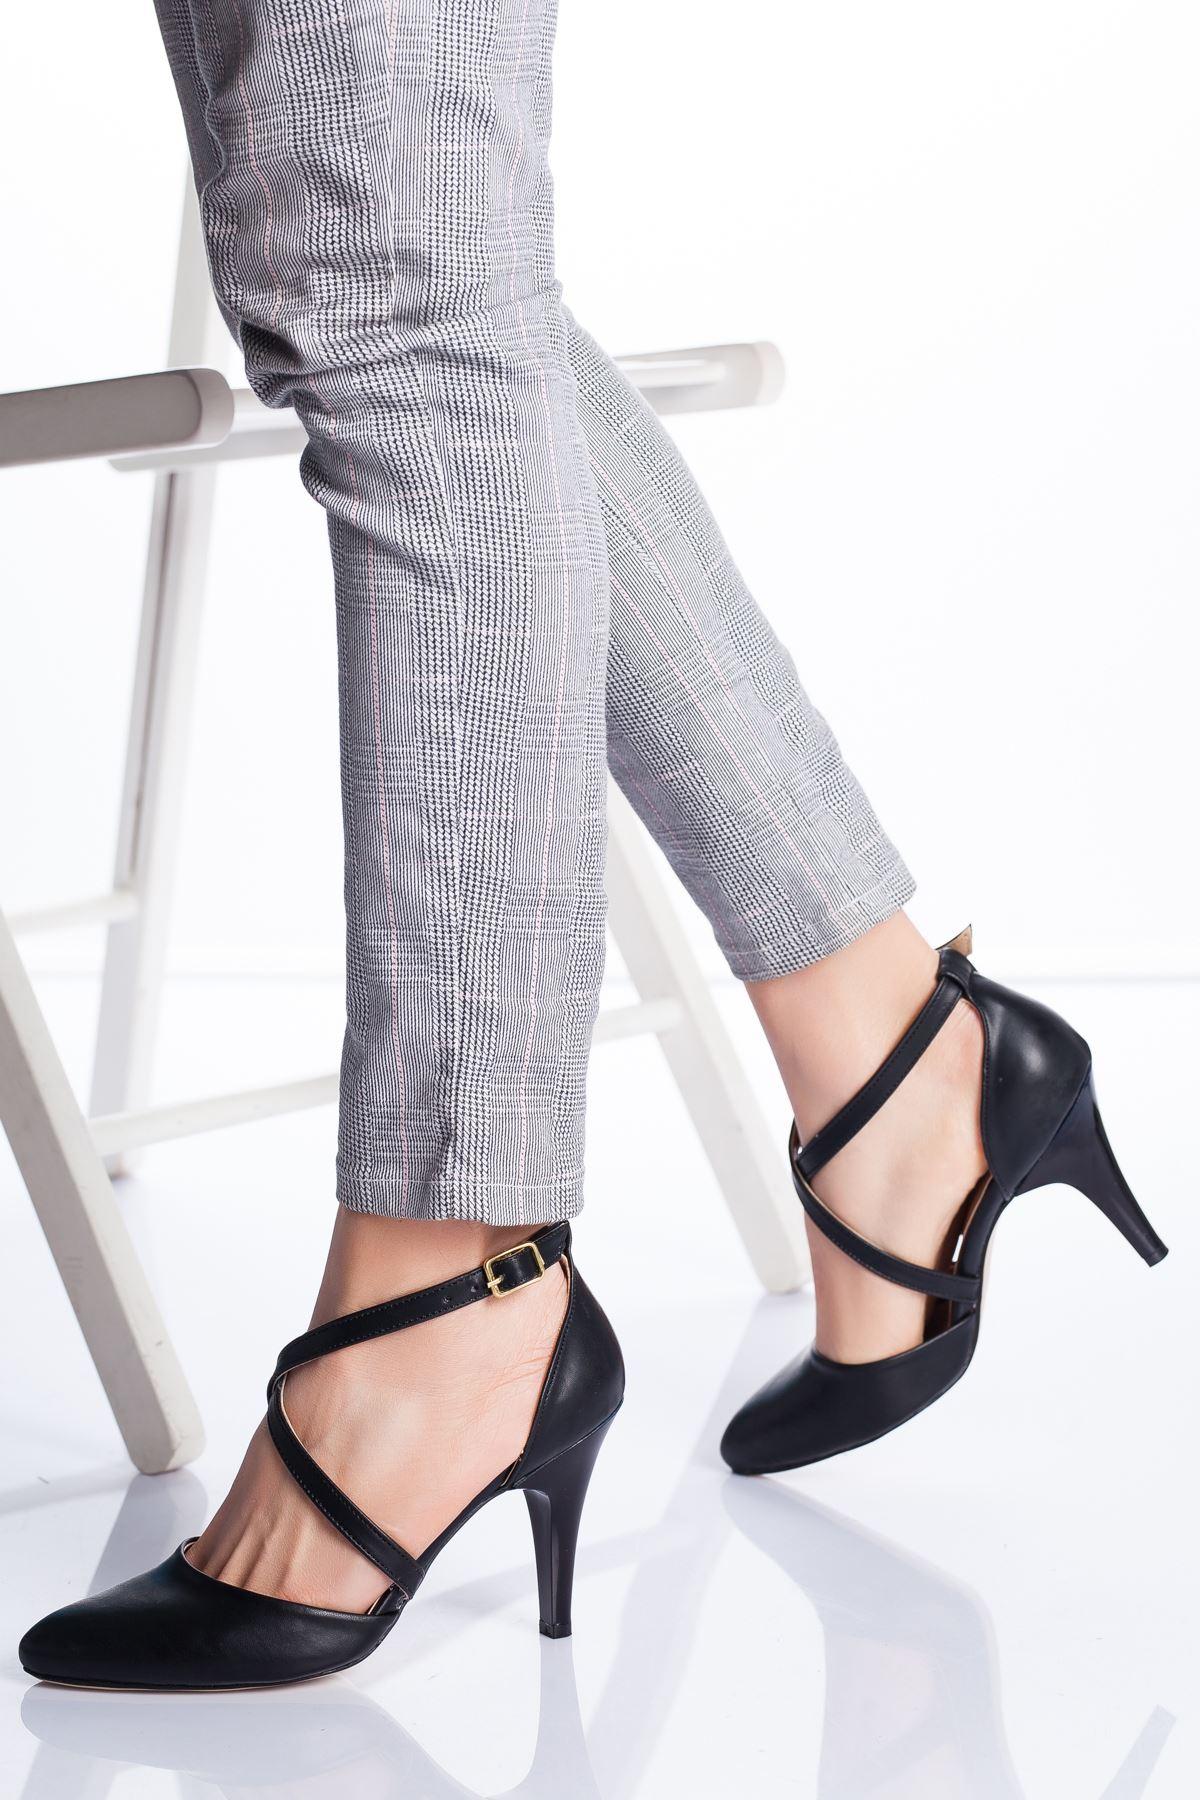 Gabel Topuklu Ayakkabı SİYAH CİLT